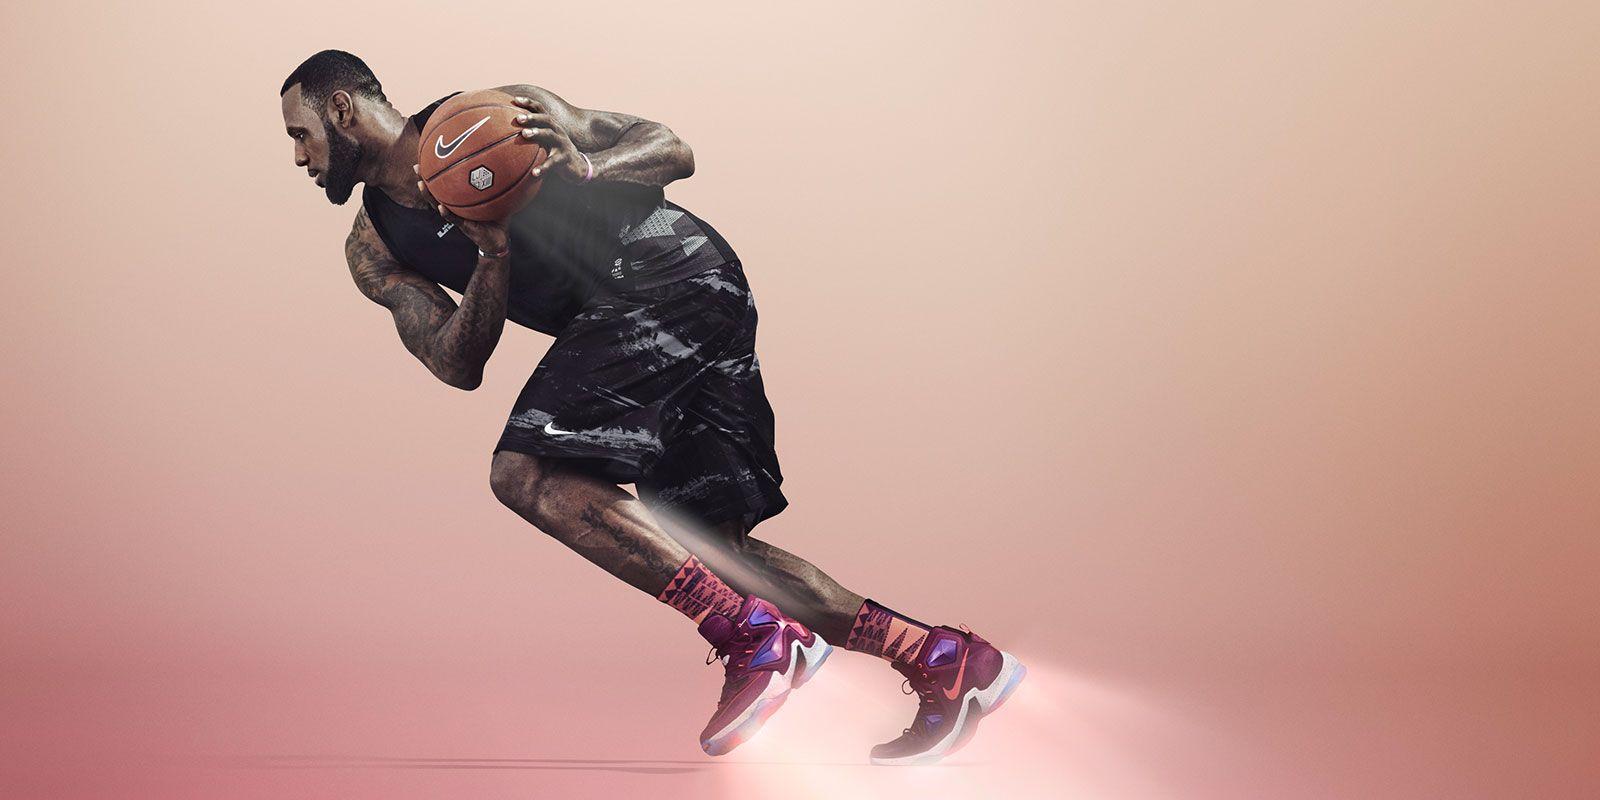 Ny Yankees Girls Wallpaper Photos Of Upcoming Lebron James Nike Shoes Leaked